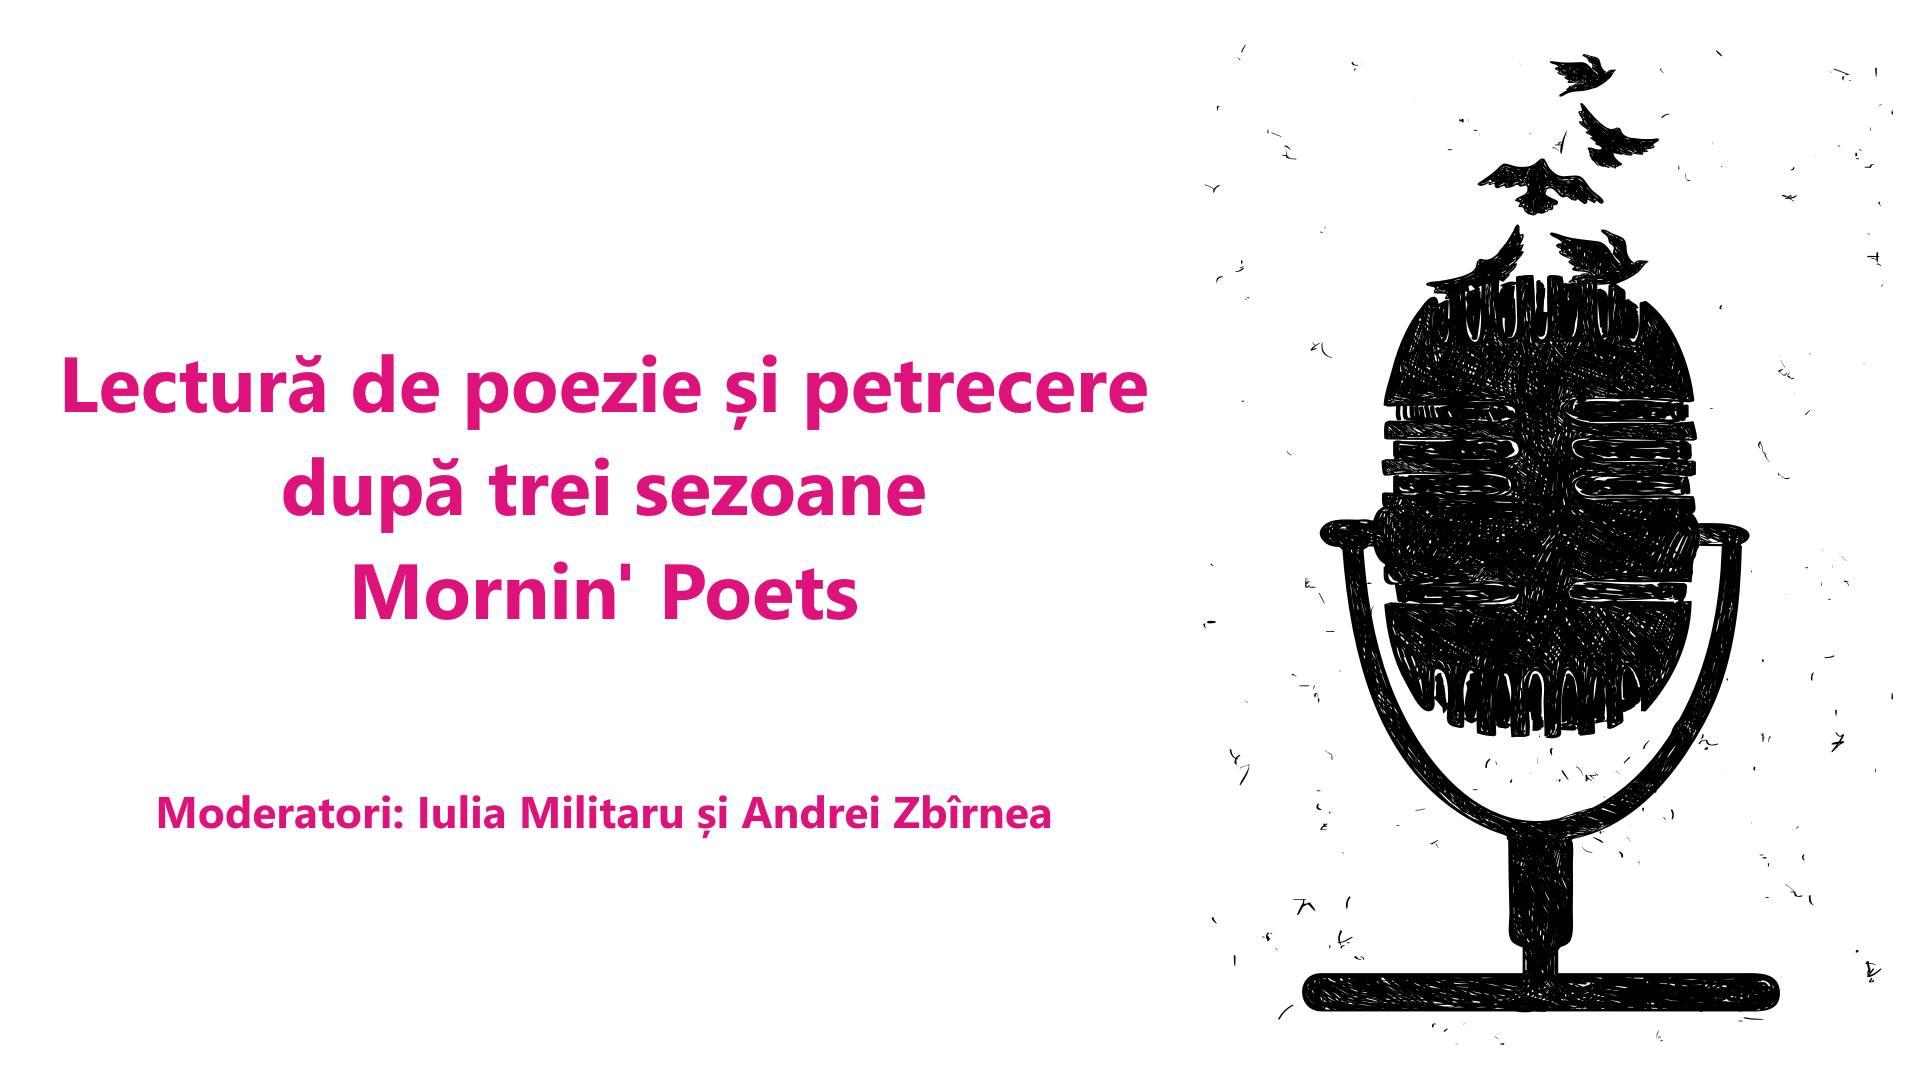 lectura-poezie-mornin-poets